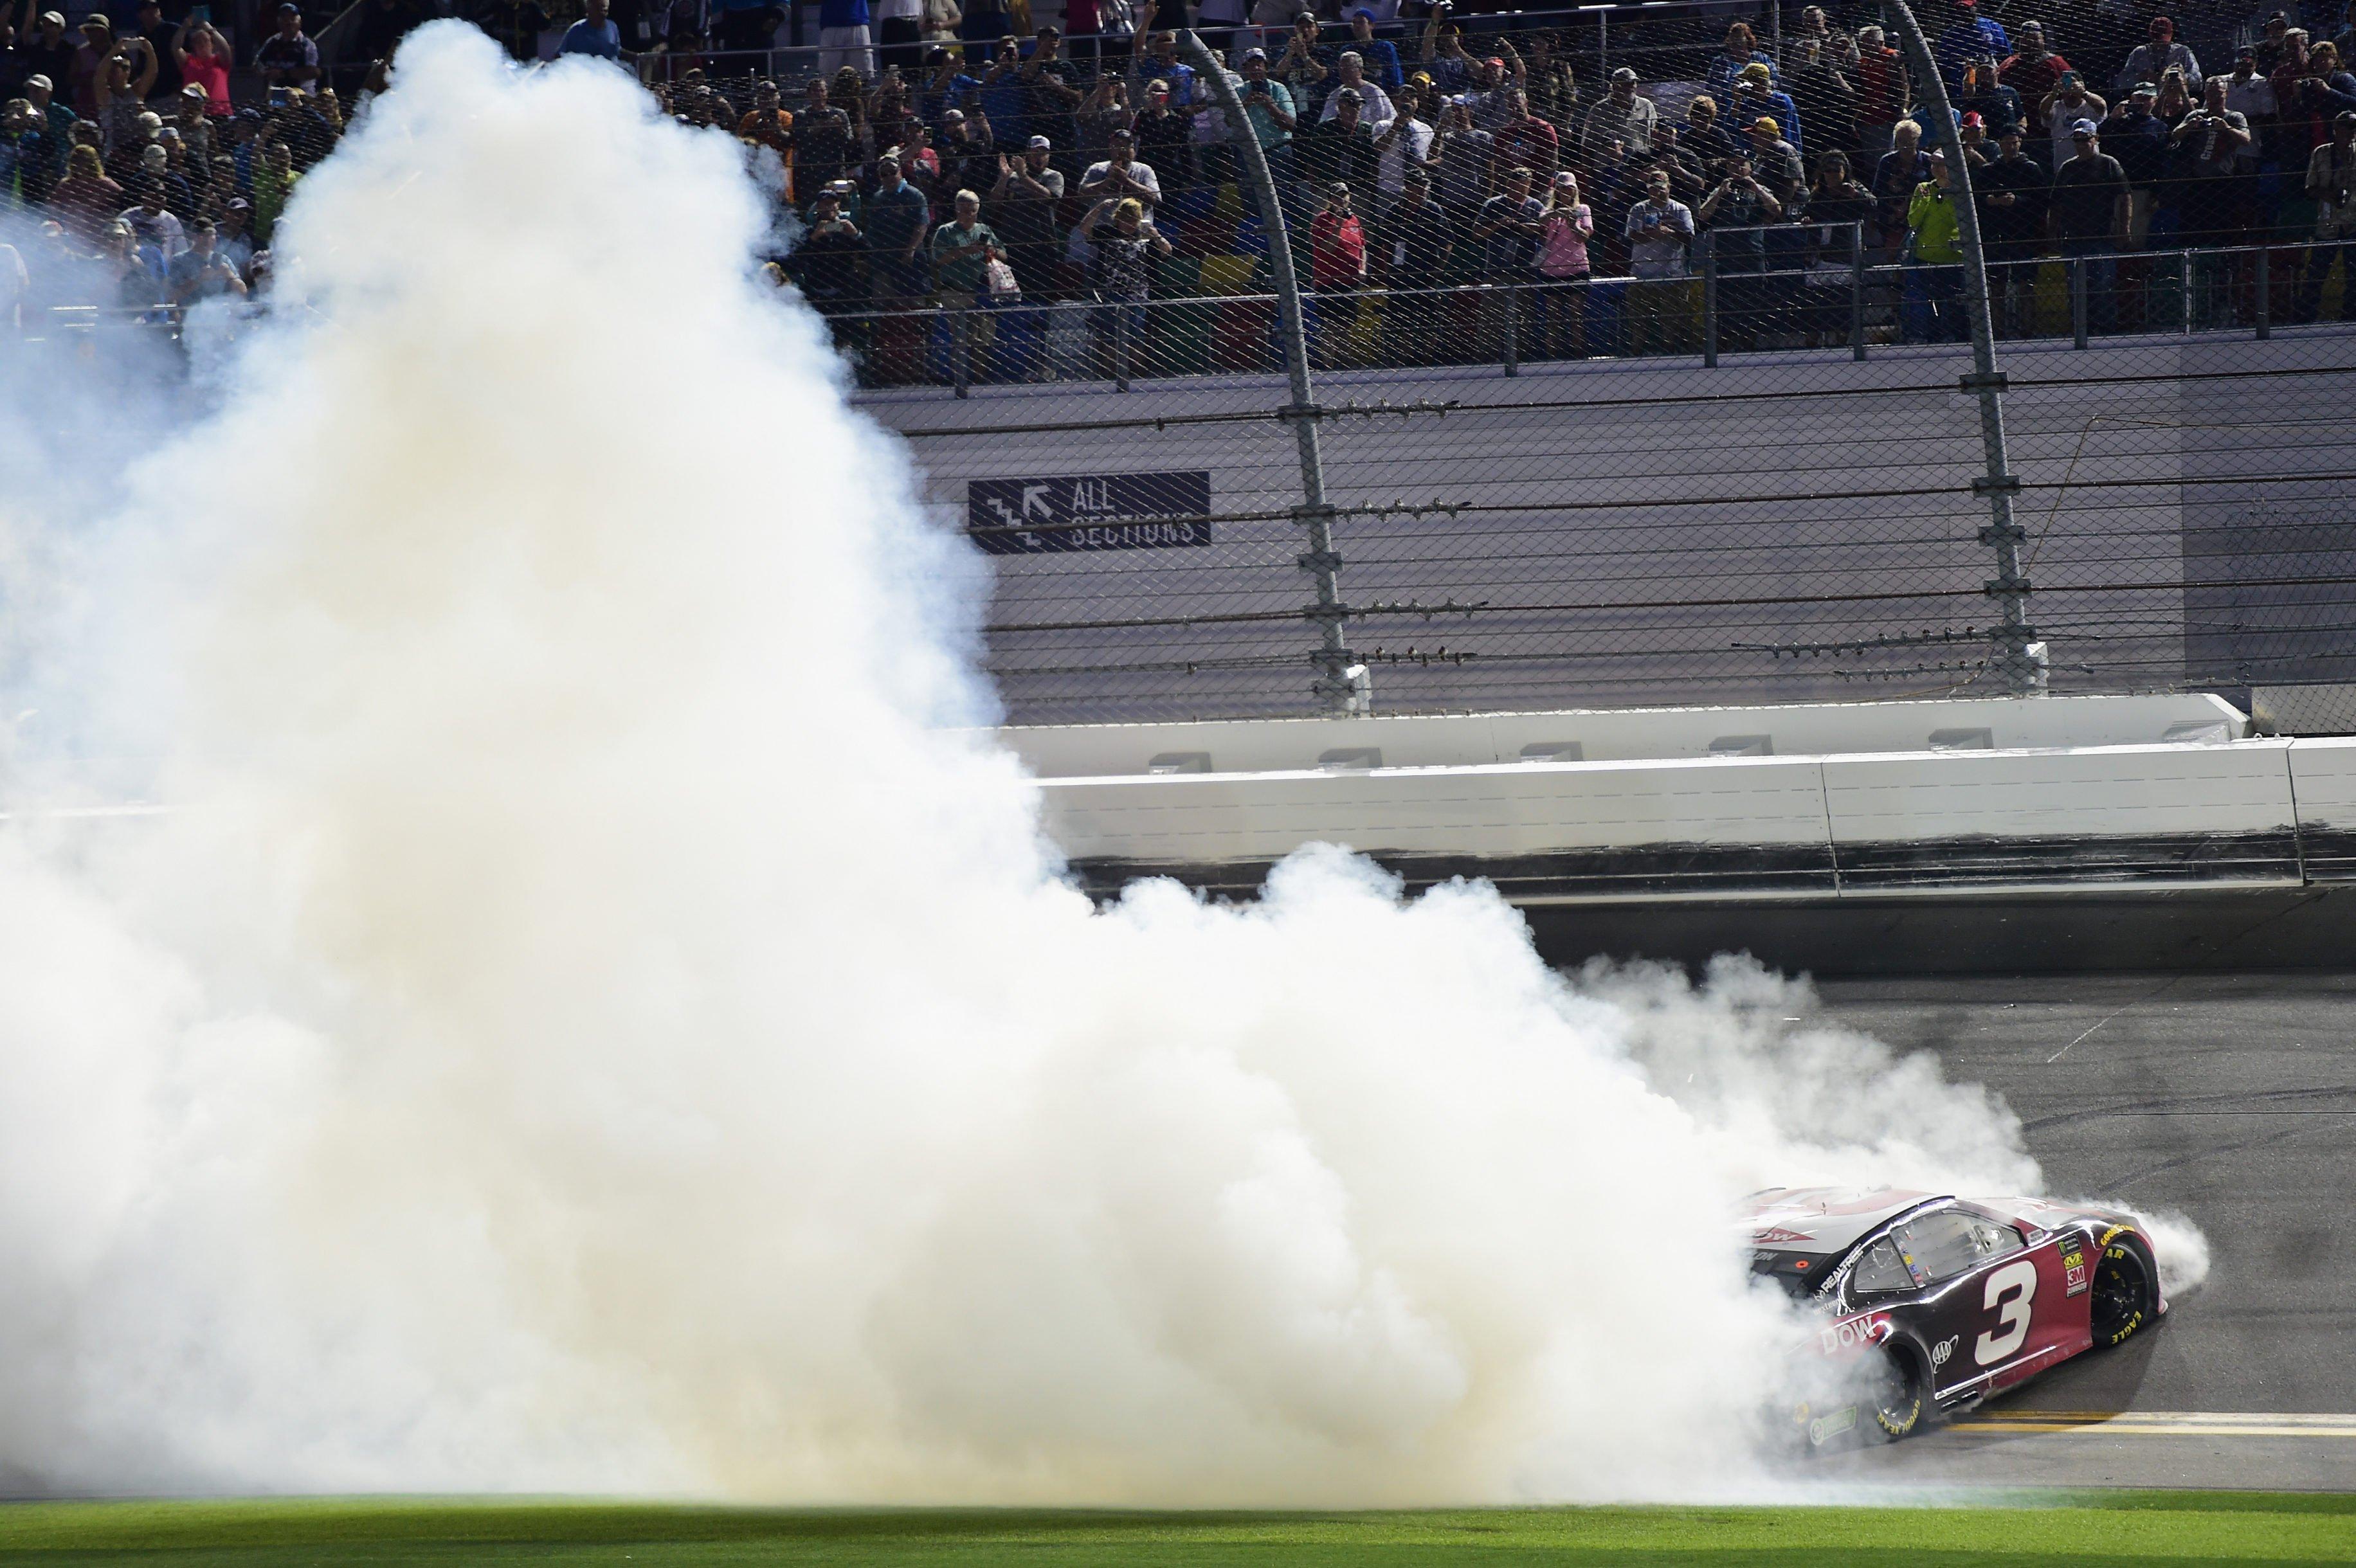 Austin Dillon wins the Daytona 500 in the #3